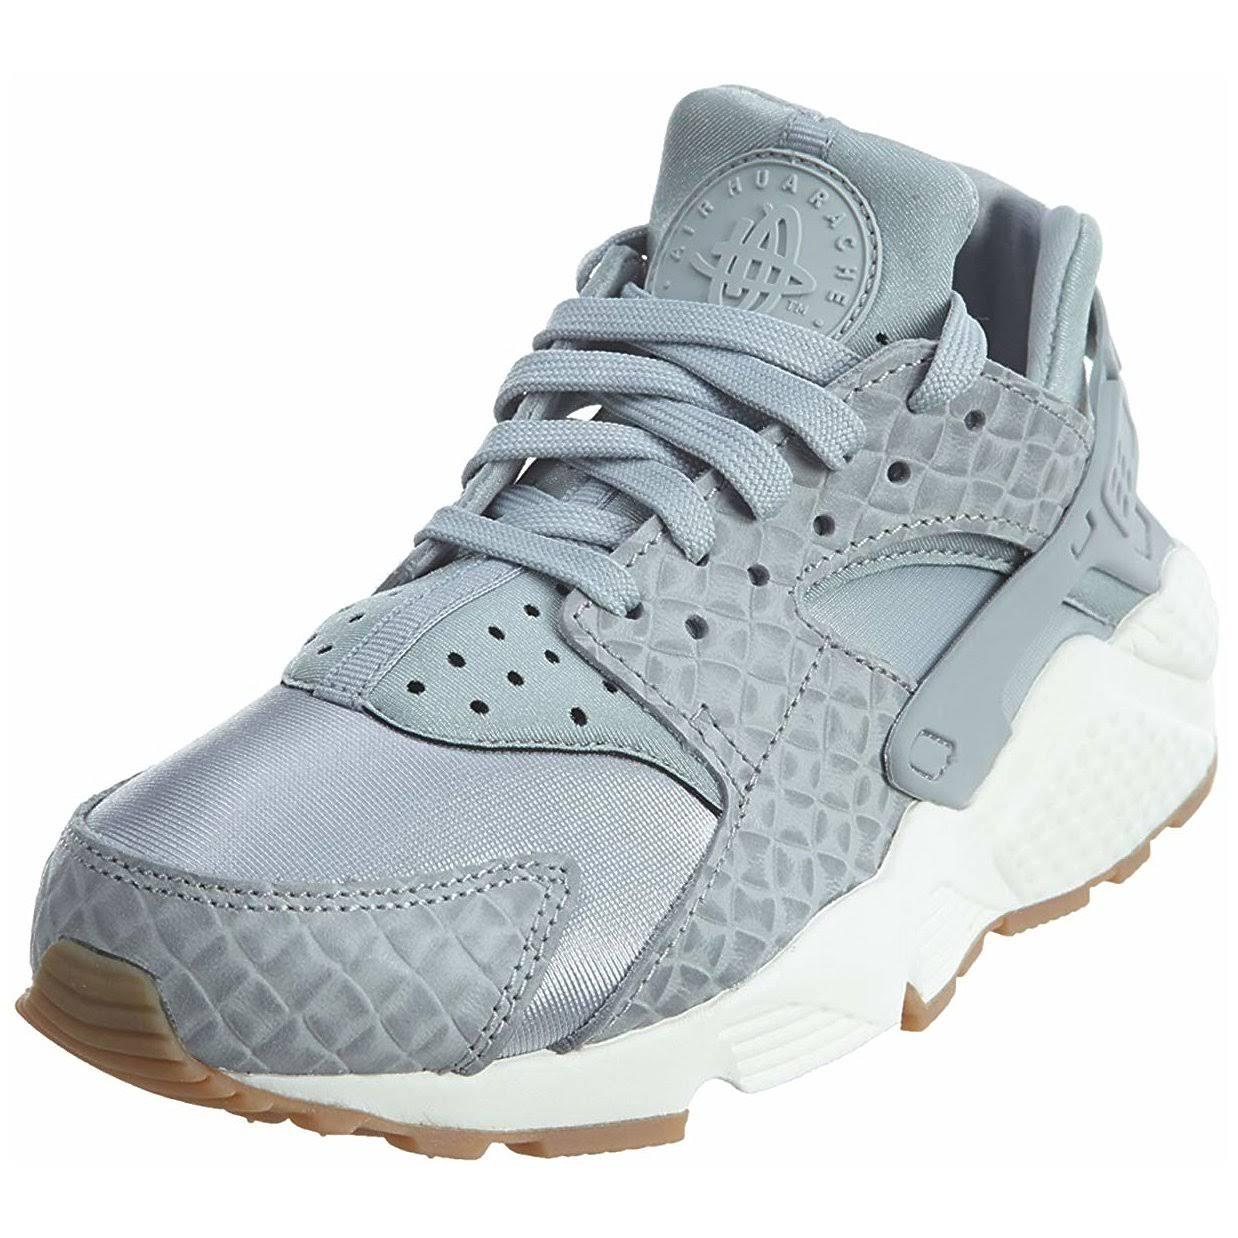 Womens Maat Air schoen Huarache 6 Nike 3TlFKJc1